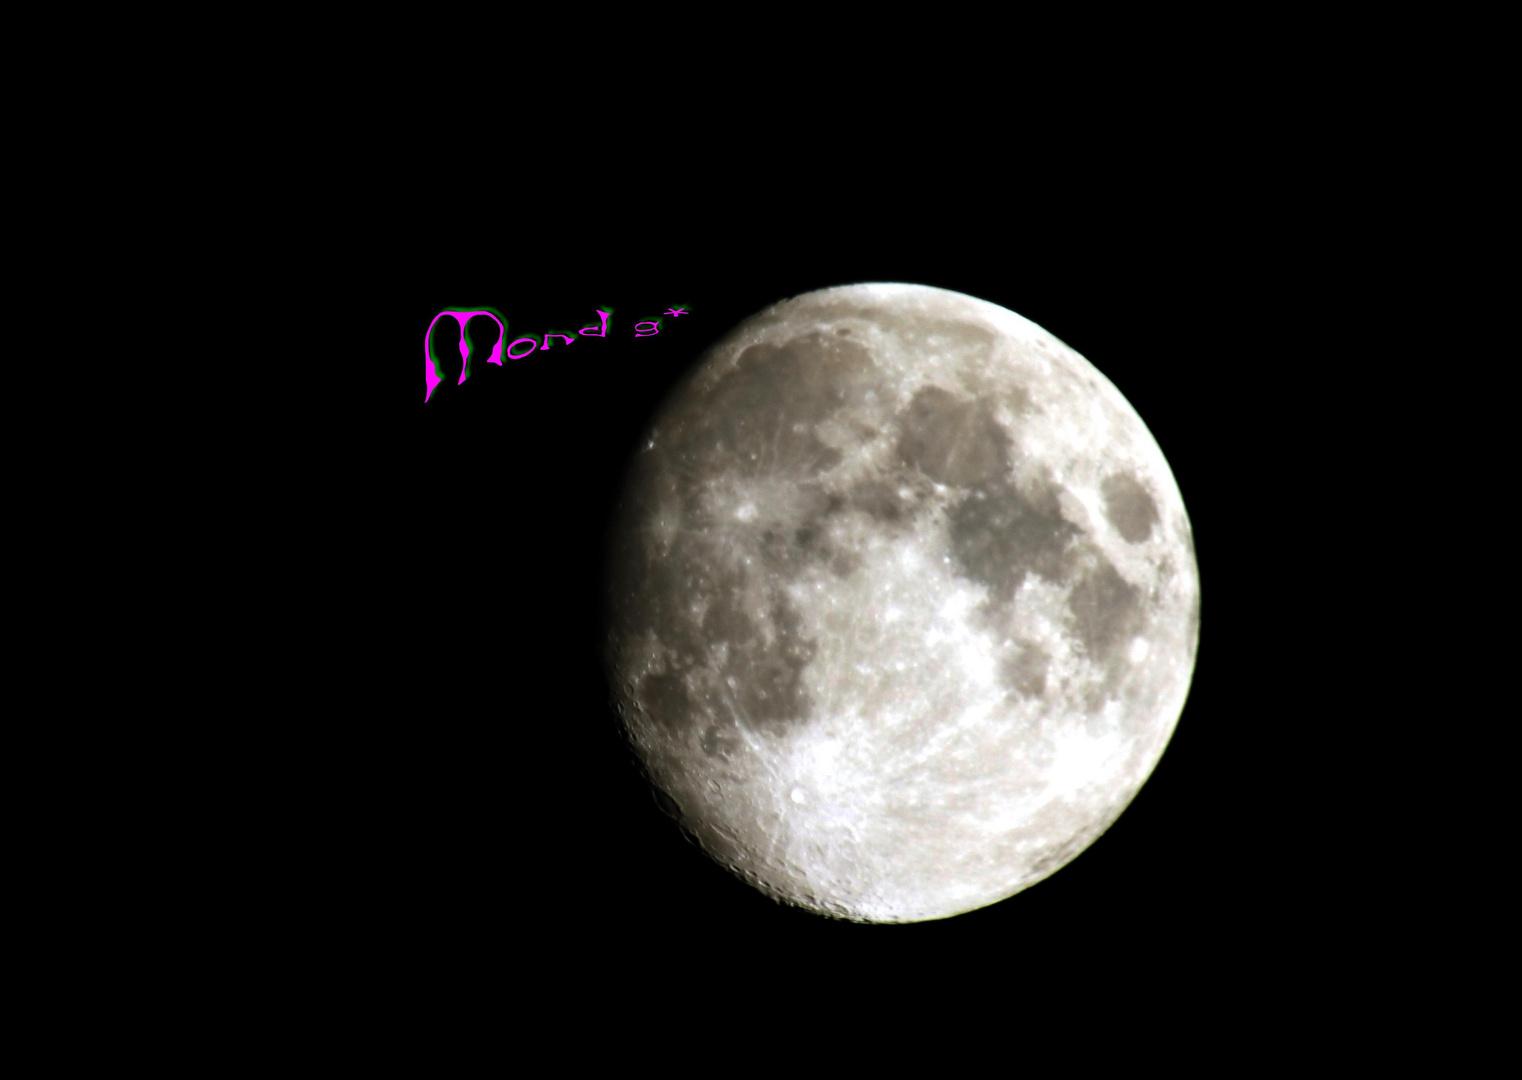 Mond ggg*